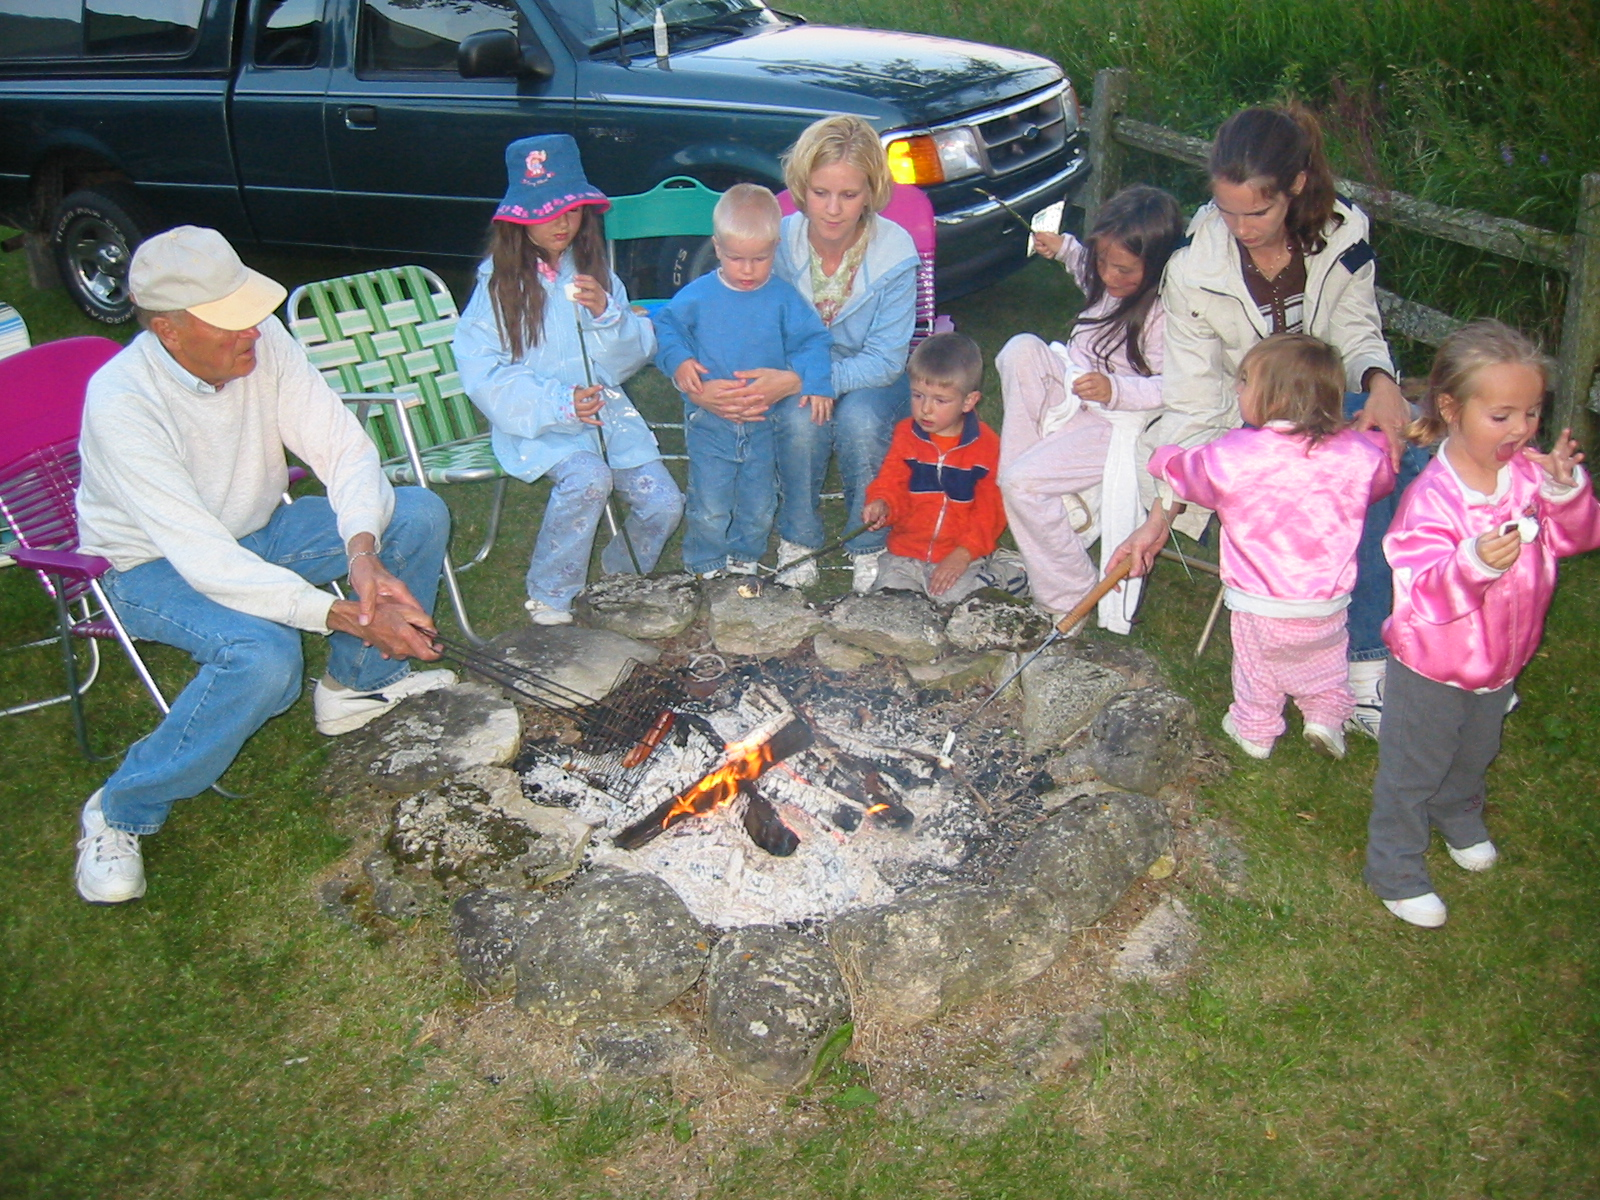 Campfire at Grandpa's